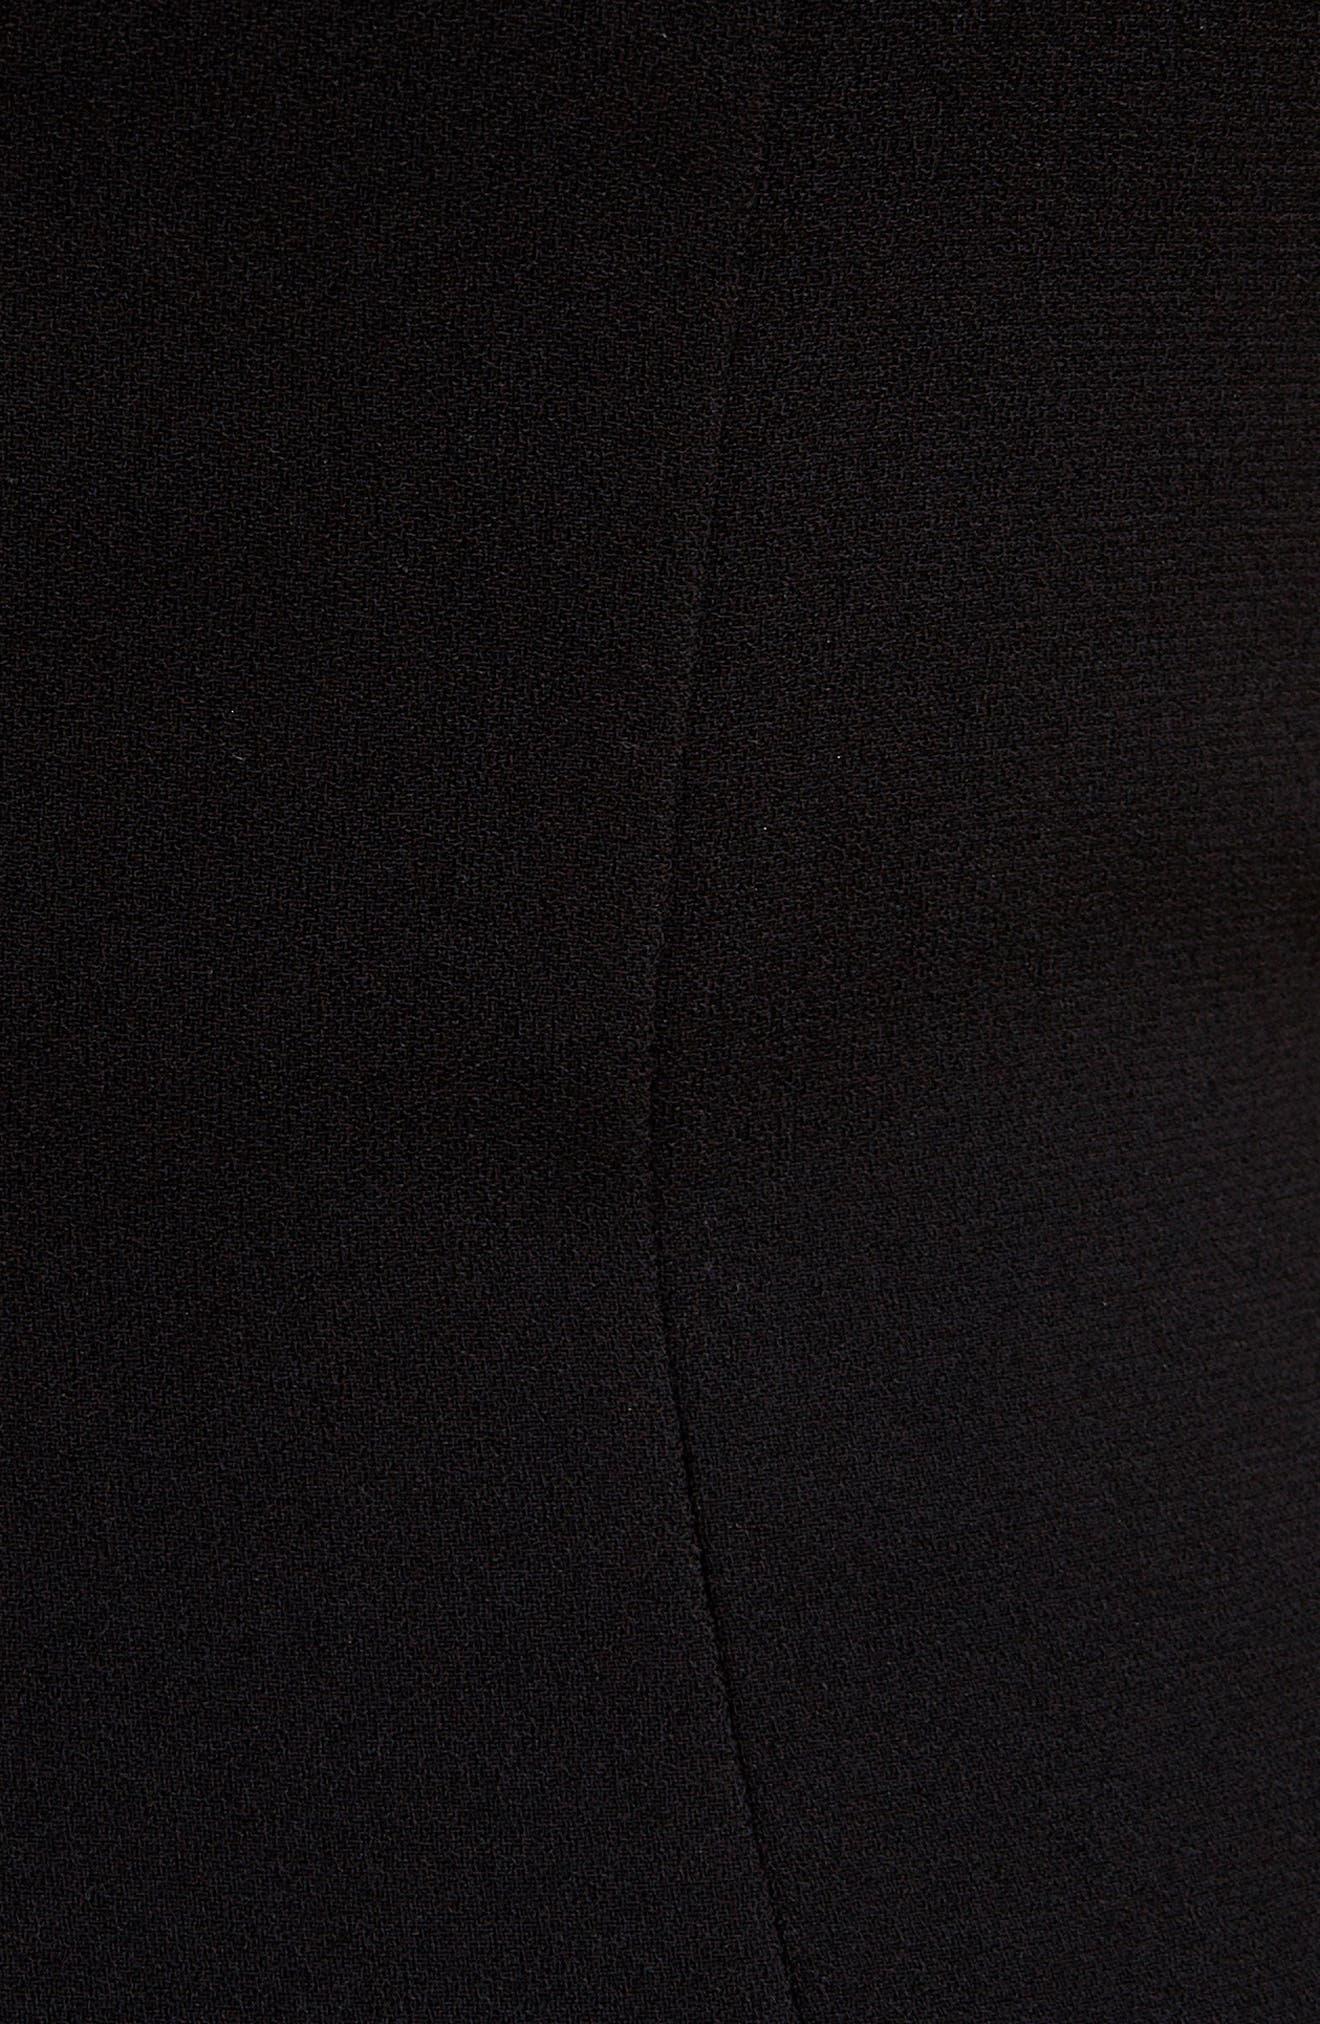 VICTORIA BECKHAM, Sheer Yoke Sheath Dress, Alternate thumbnail 5, color, BLACK